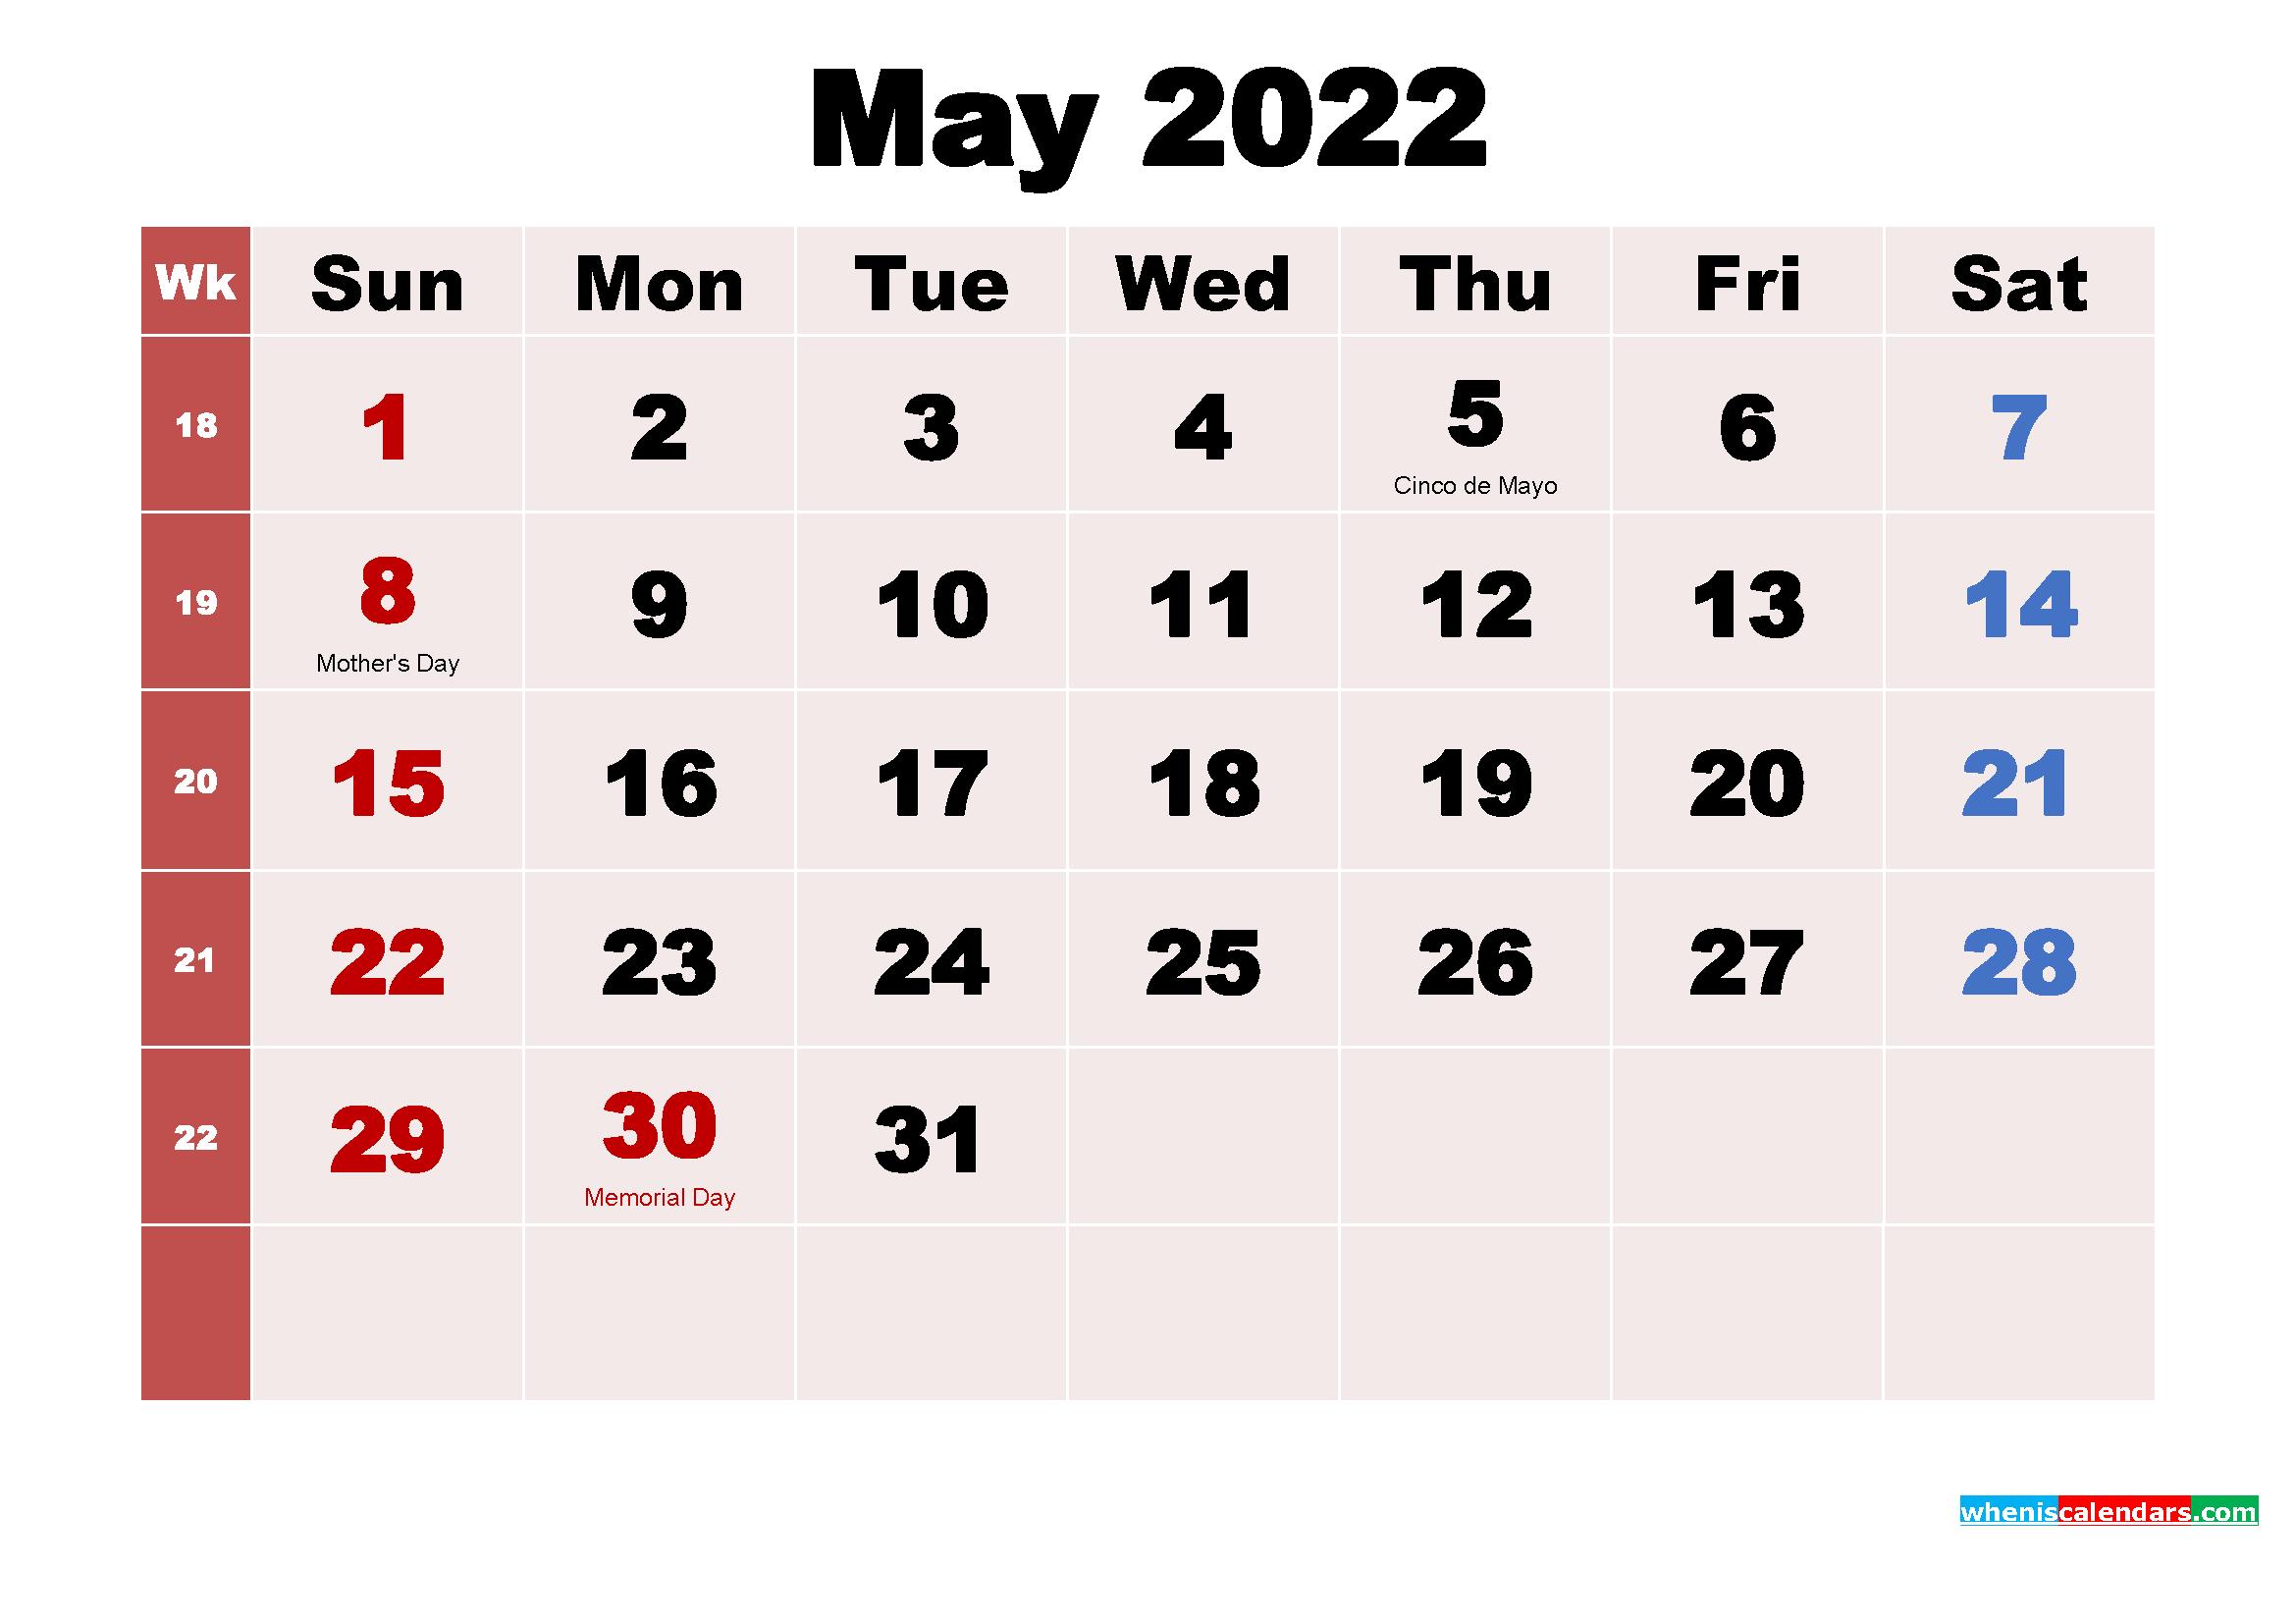 May 2022 Printable Calendar with Holidays